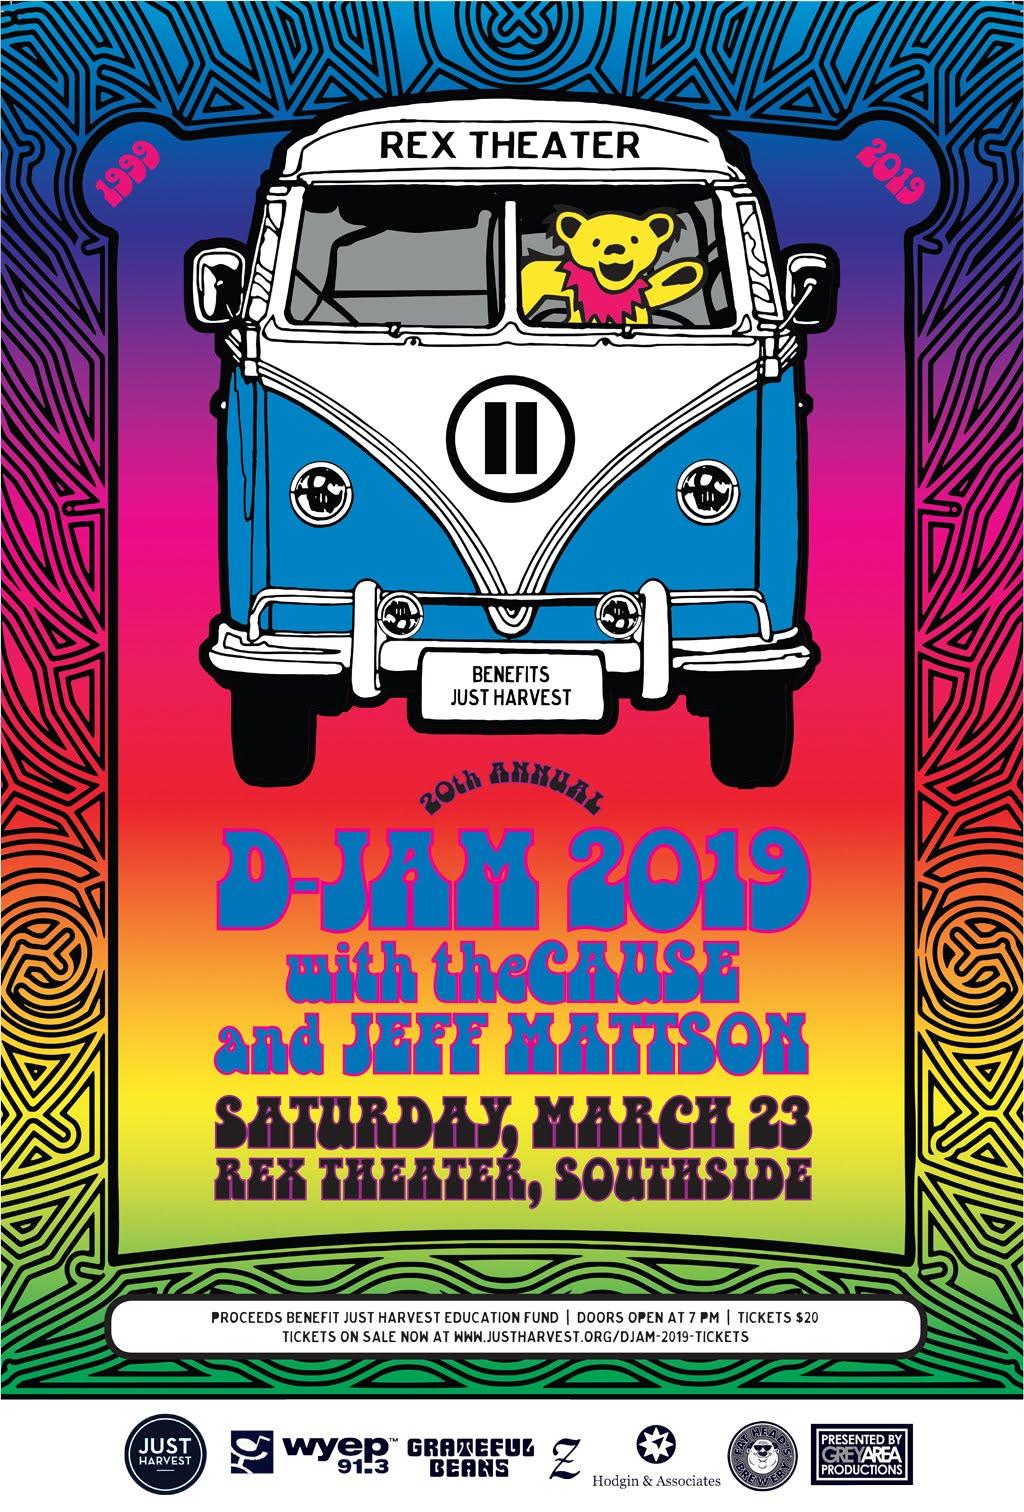 D-Jam 2019 poster